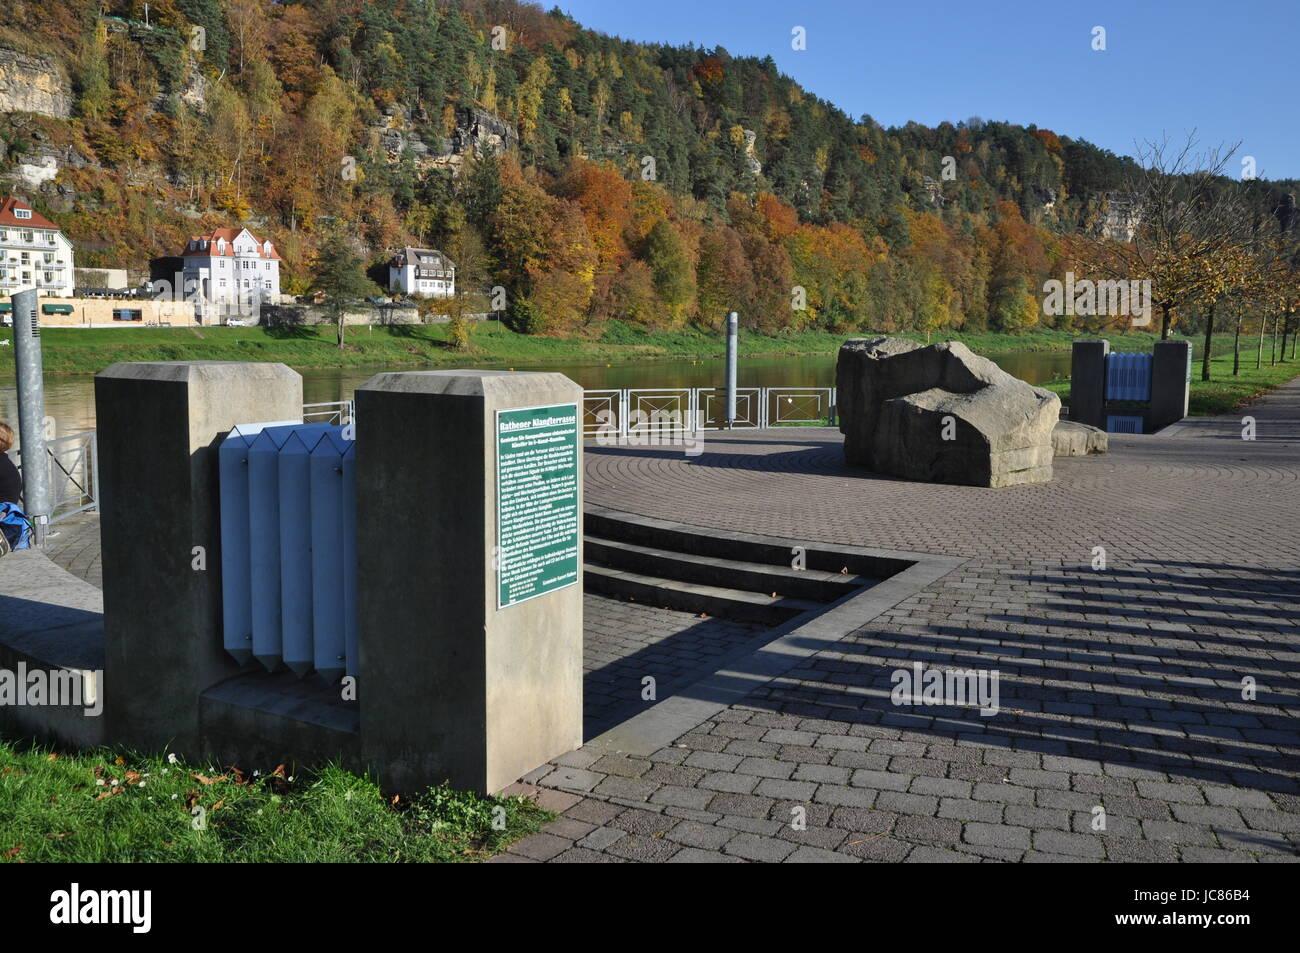 klangterrasse, Kurort Rathen, rathen, niederrathen, kleine bastei,  elbe, elbsandstein, elbsandsteingebirge, sächsische - Stock Image